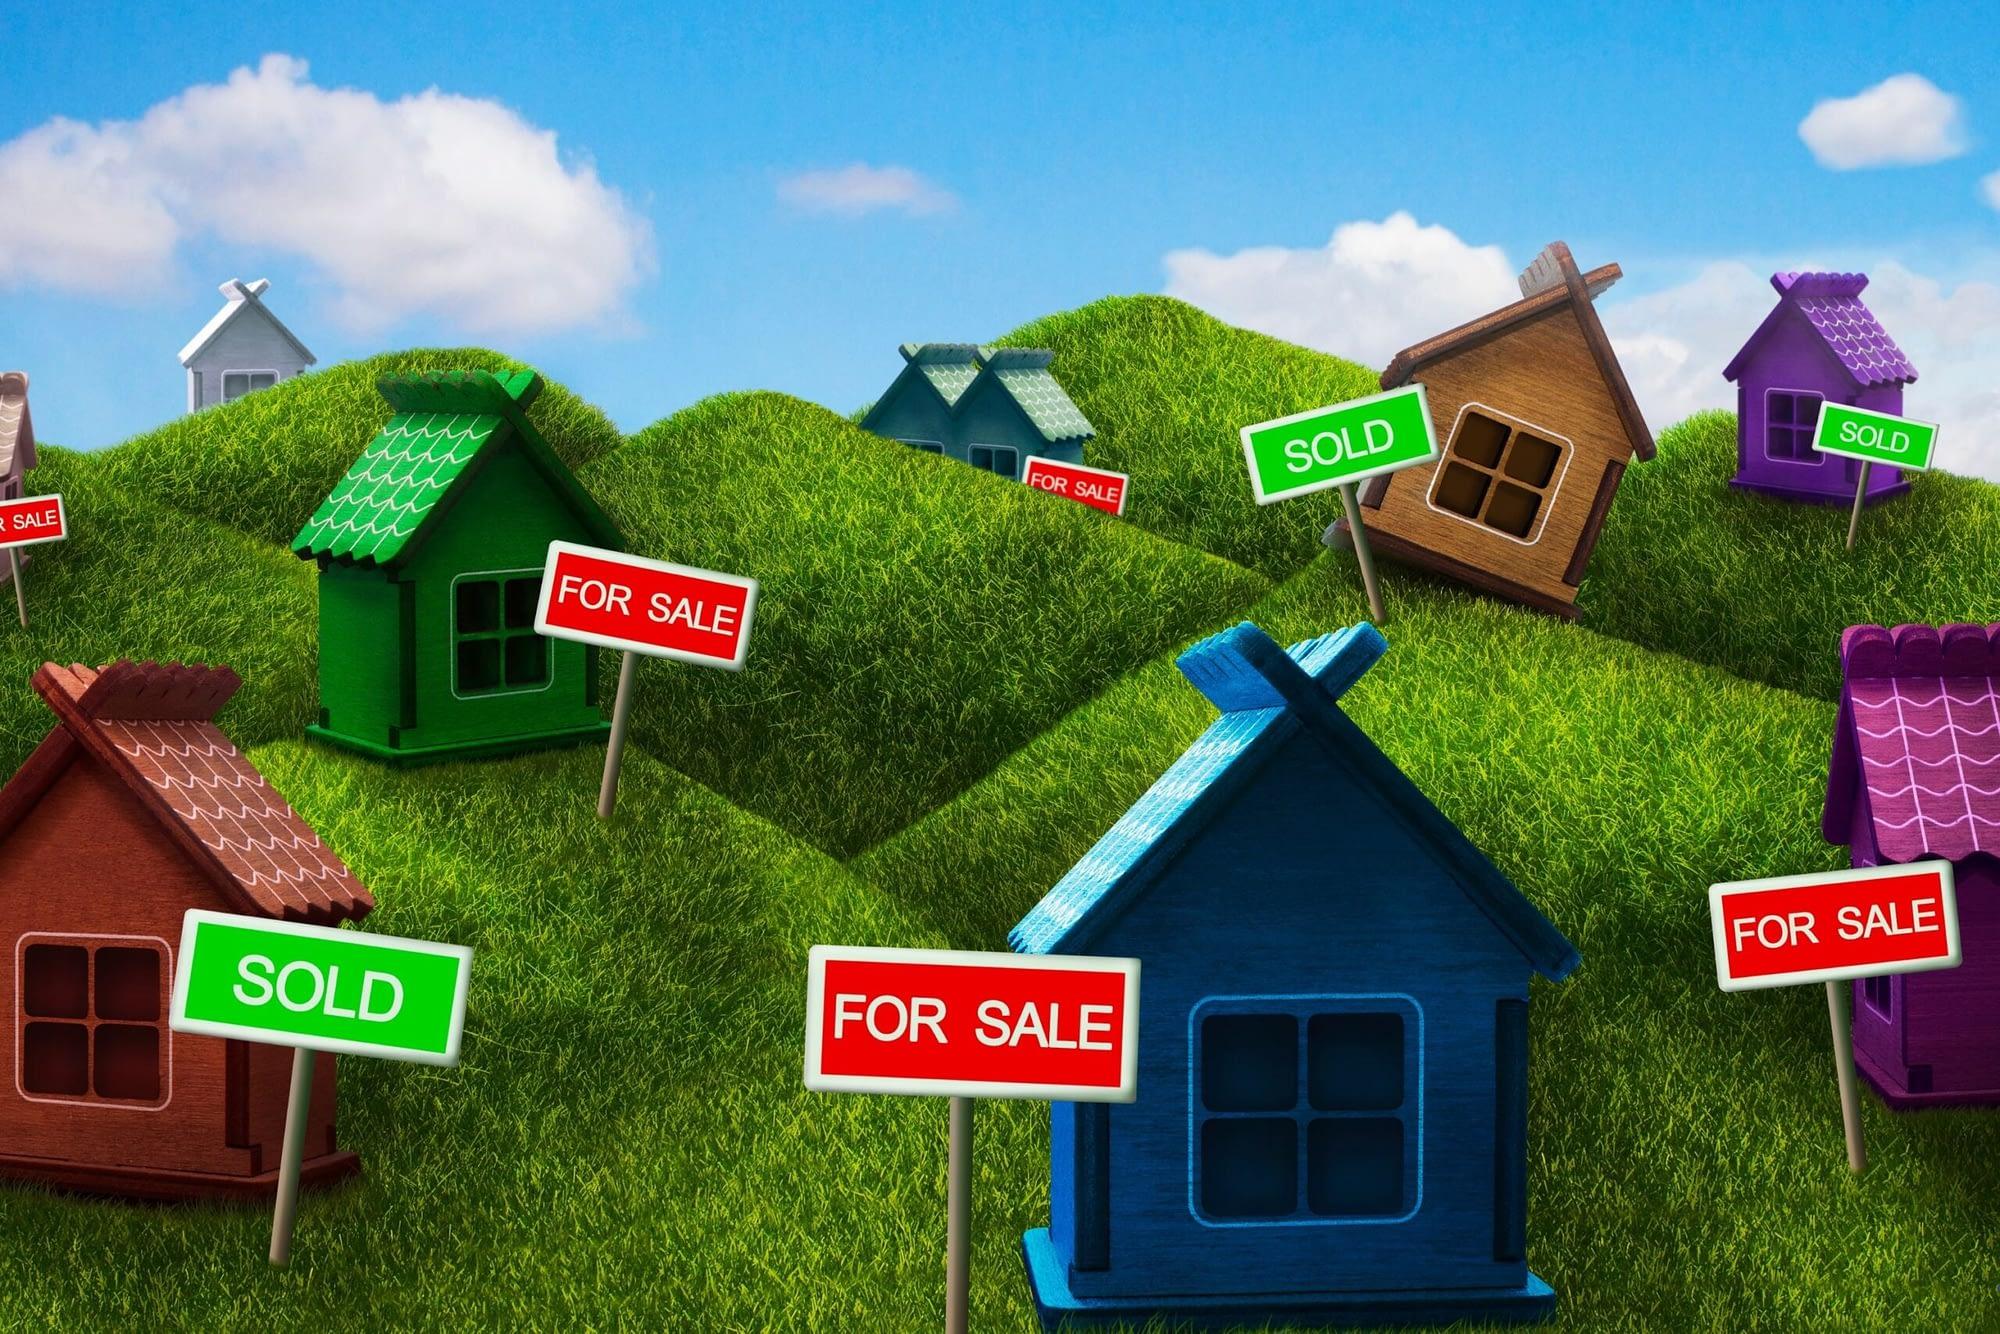 Brussel bezorgd over oververhitte Nederlandse huizenmarkt